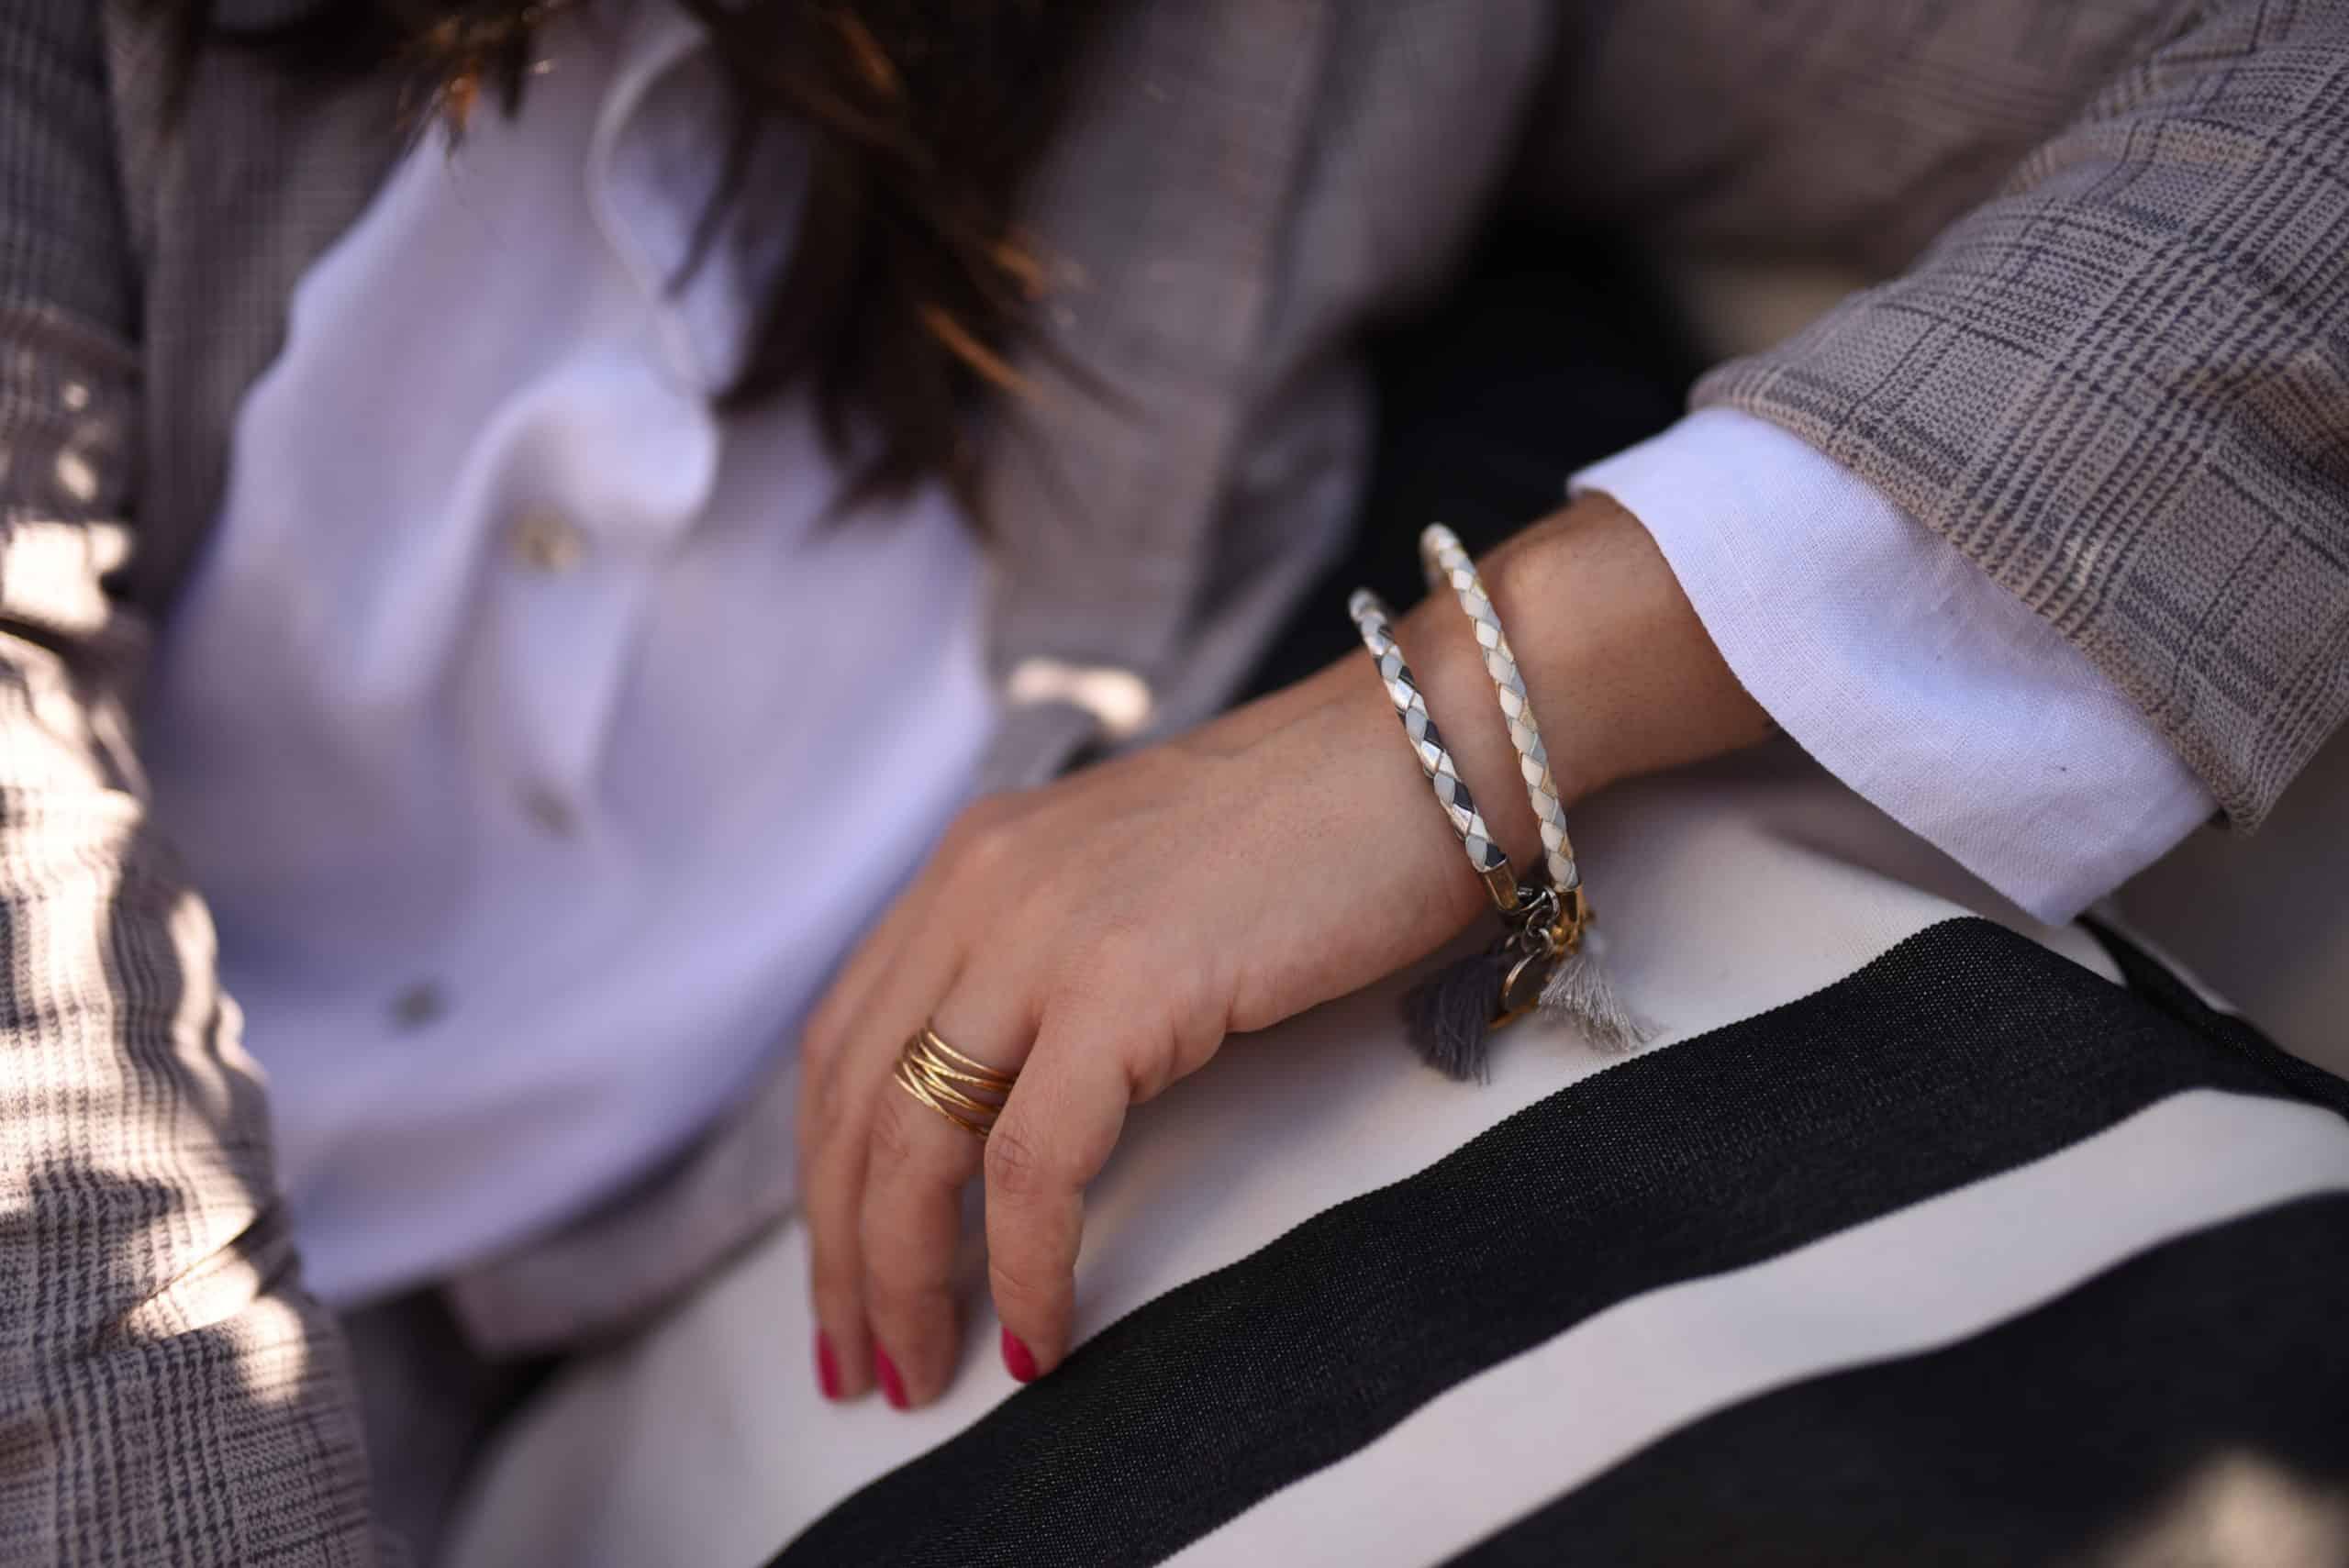 BDM STUDIO anillo joyas oro mujer hecho a mano paris complementos moda grand orient